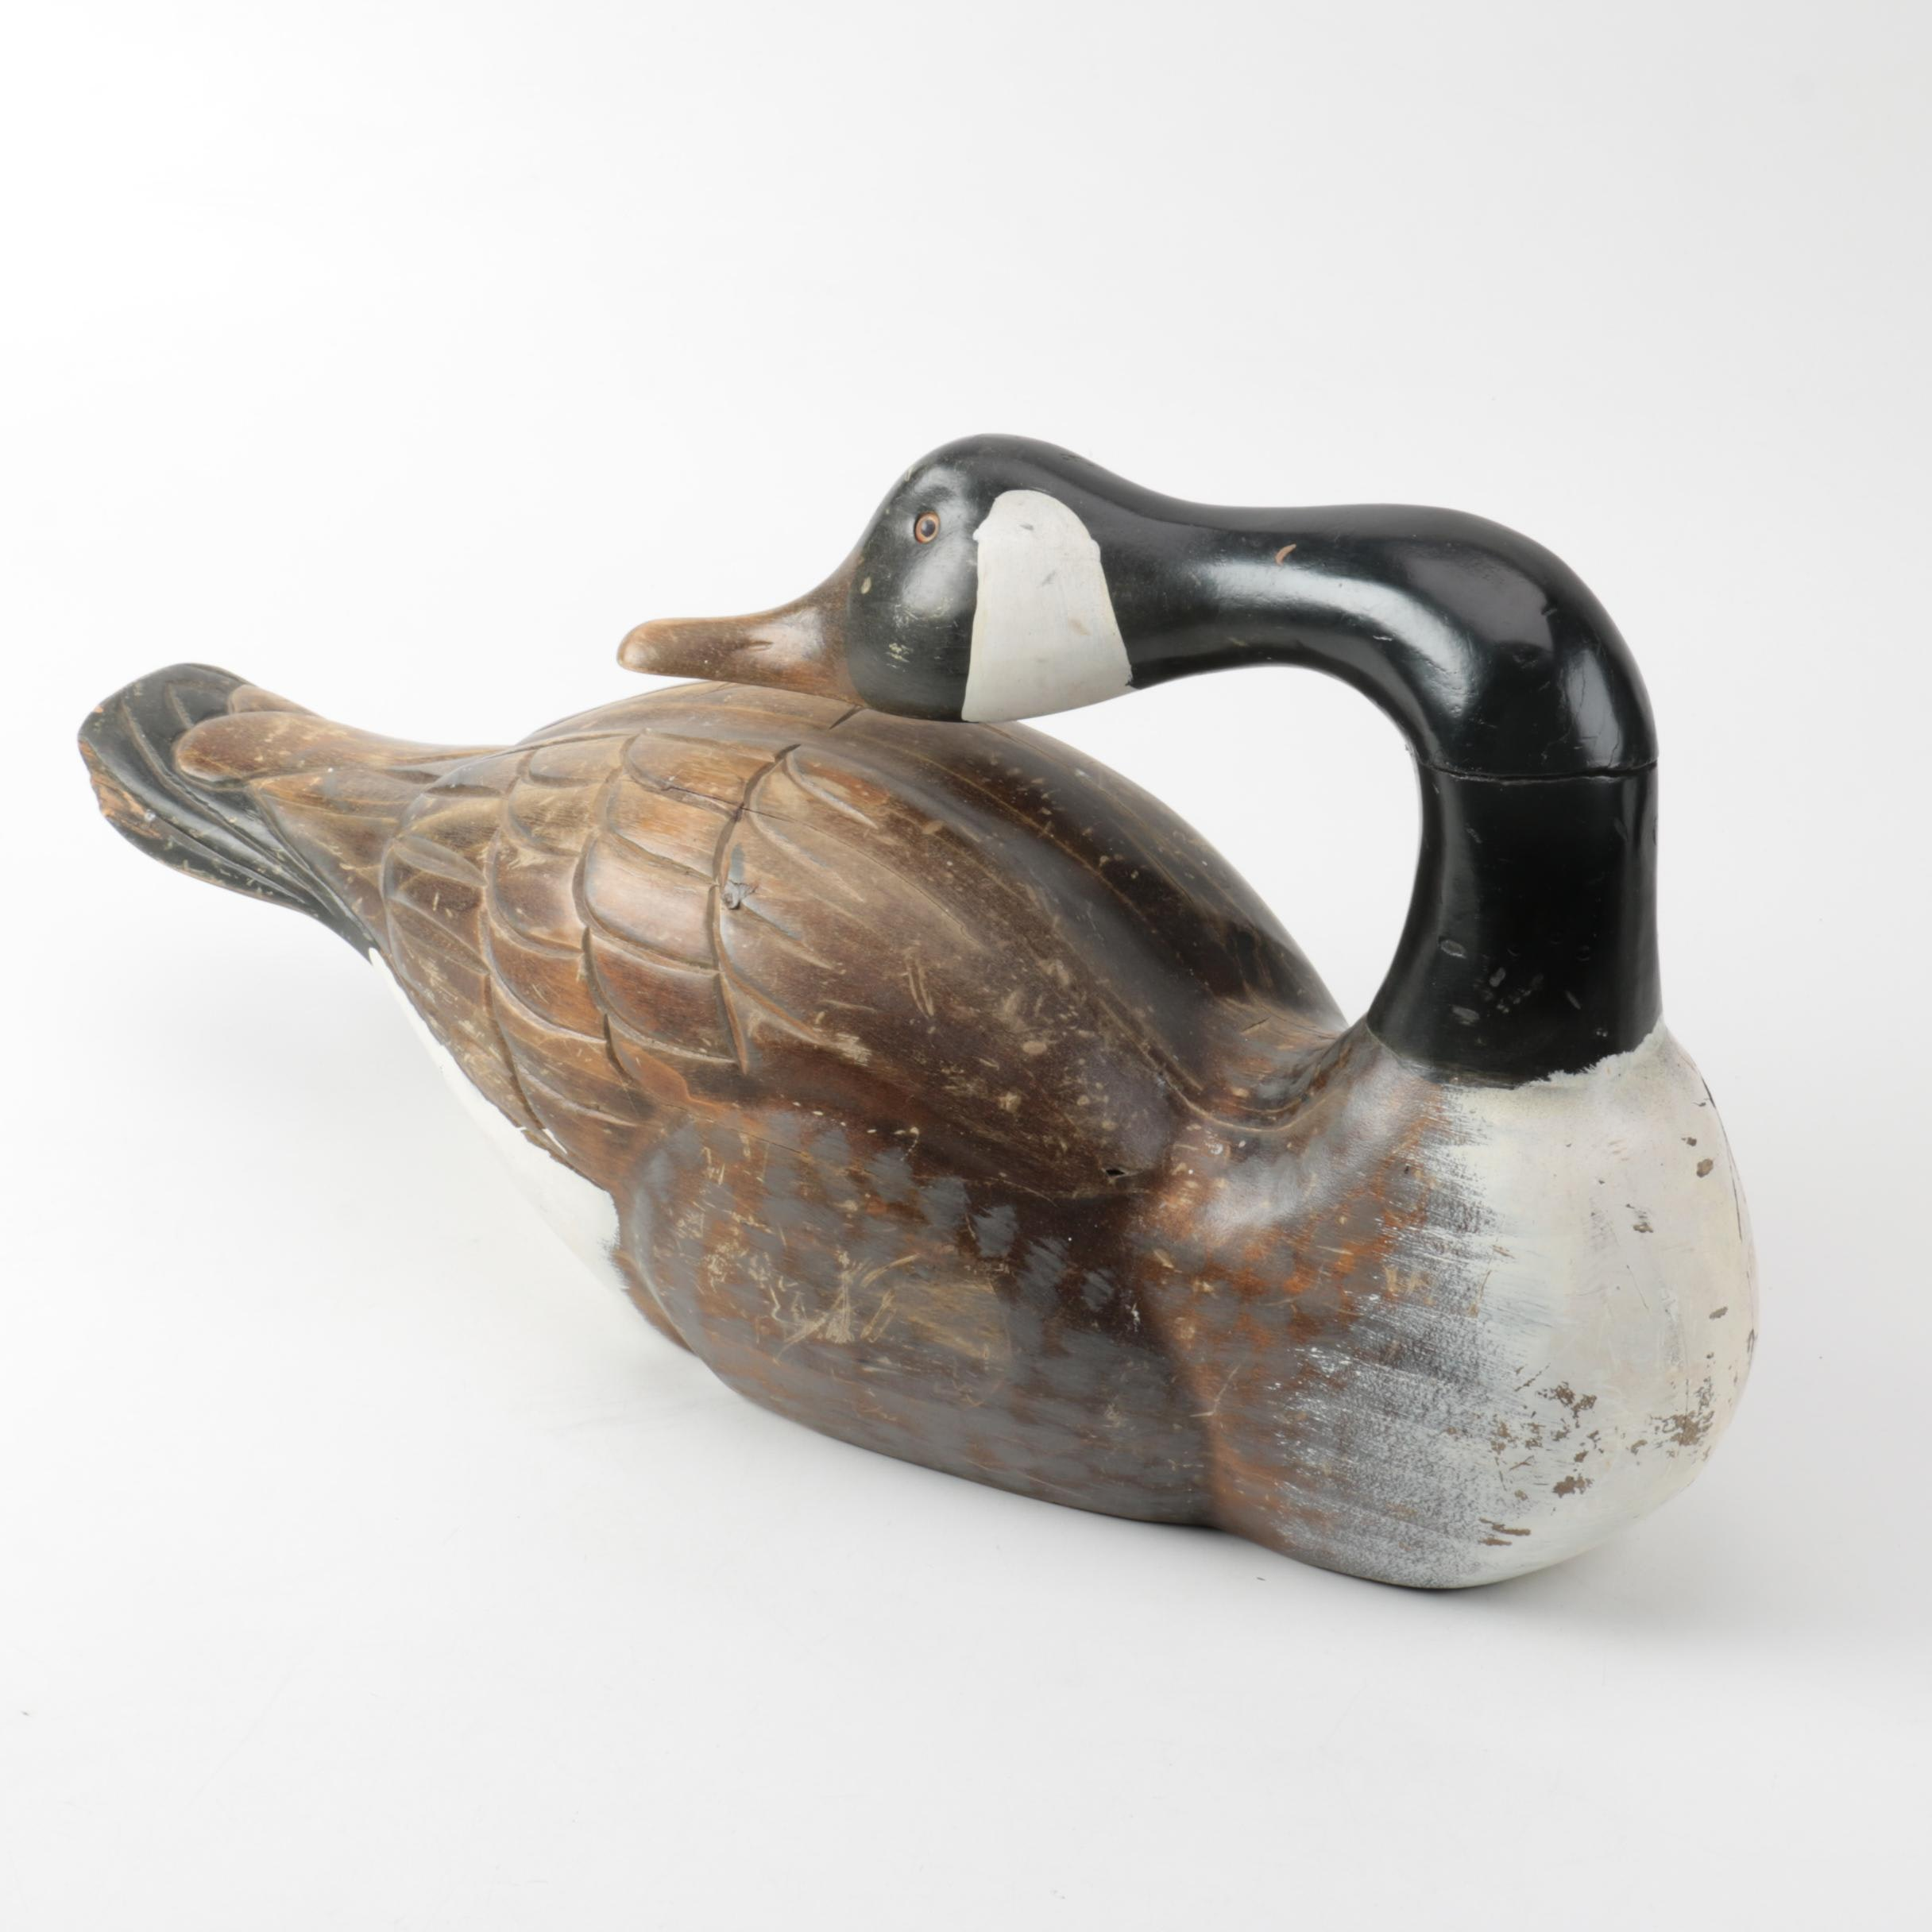 Wooden Canadian Goose Decoy Figurine